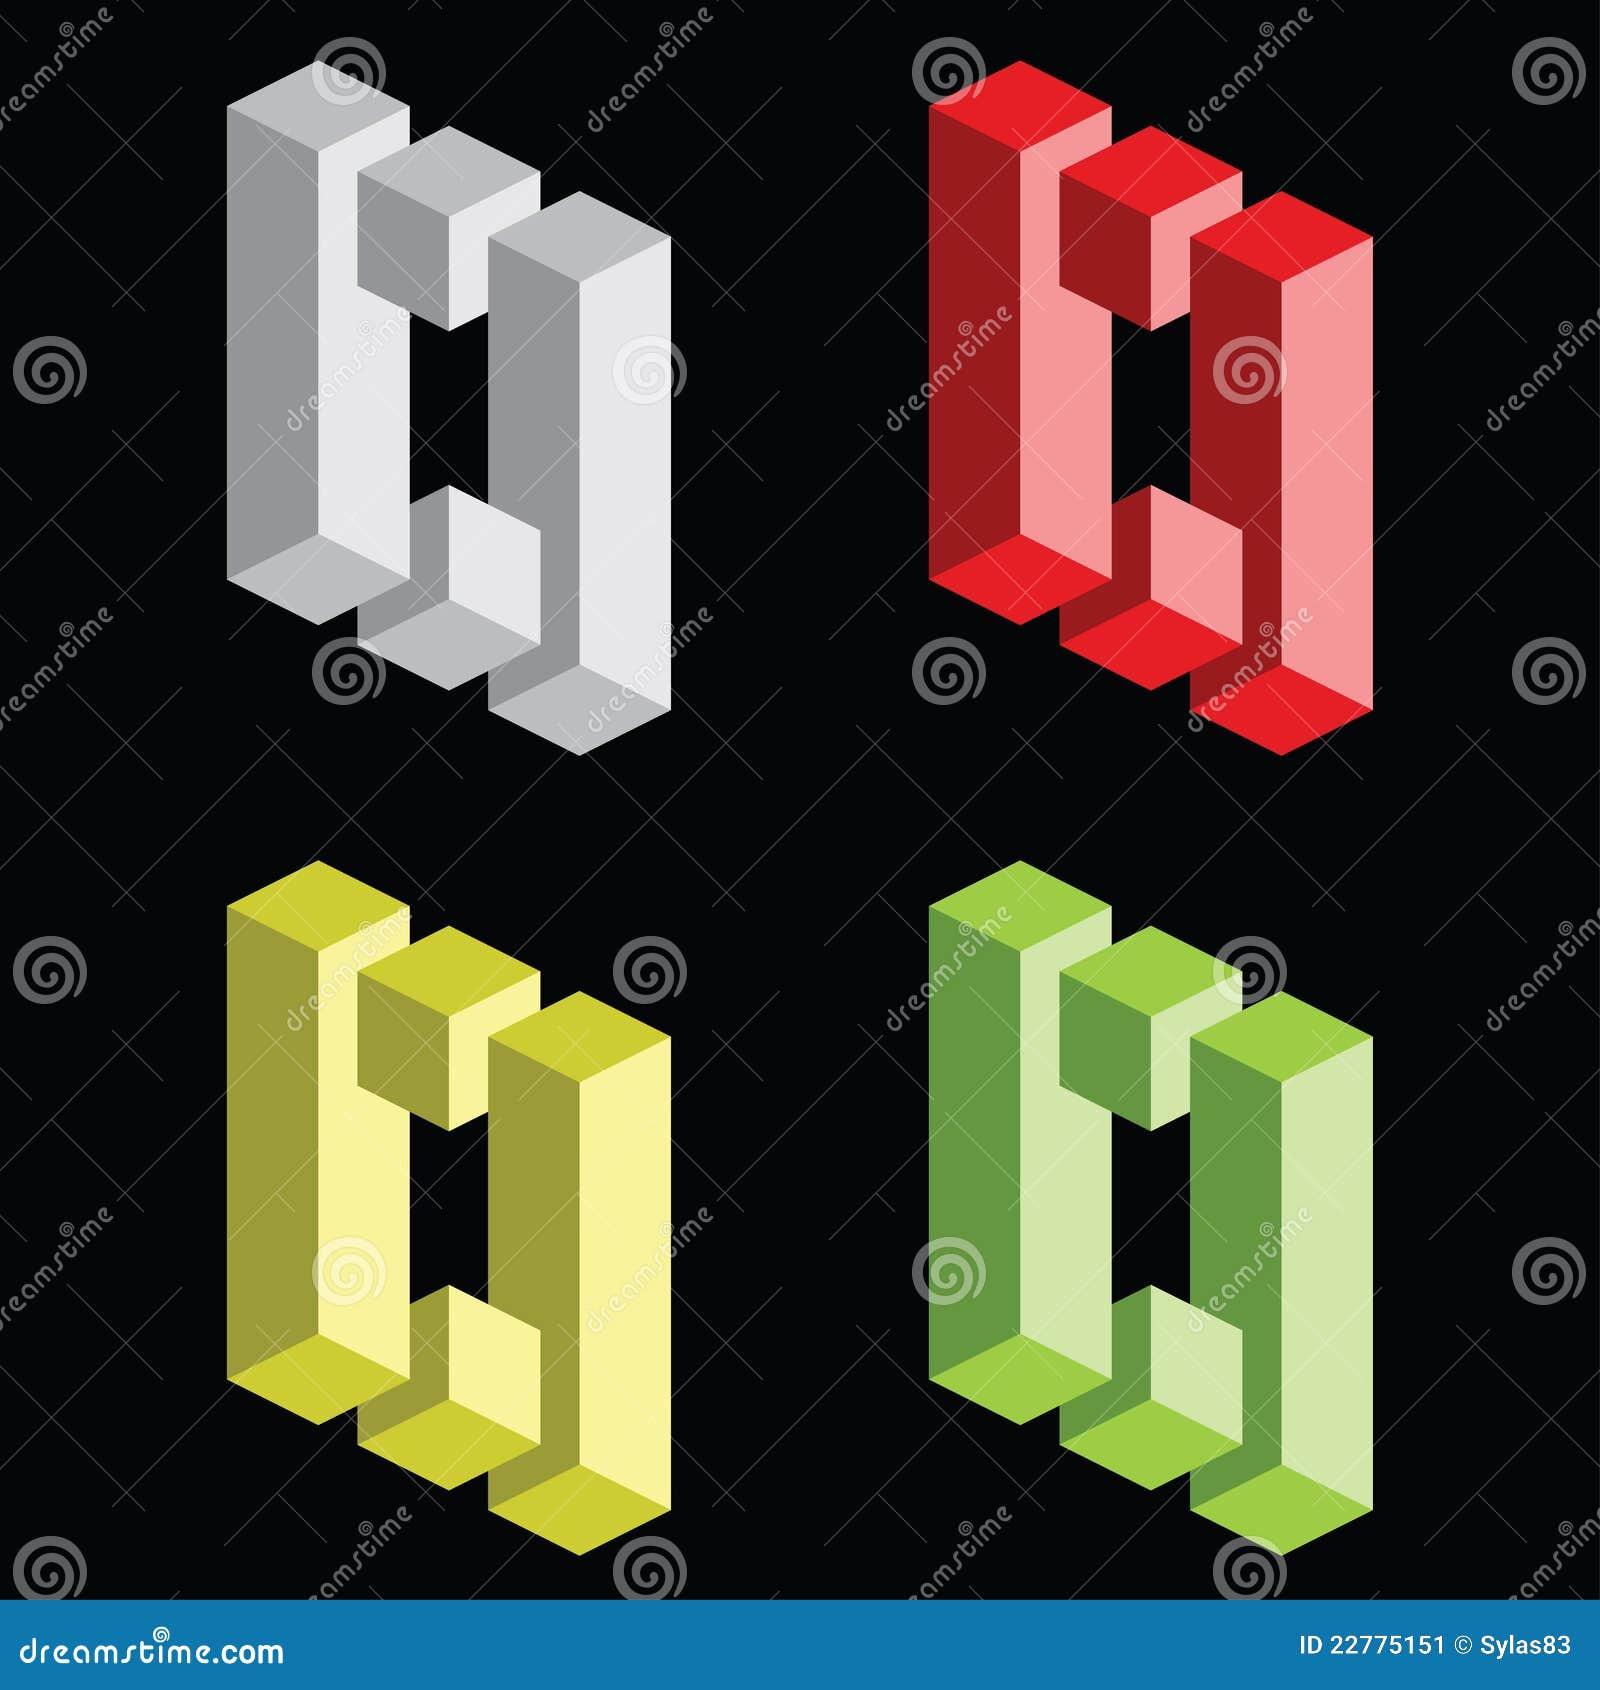 Optical illusion, colorful blocks